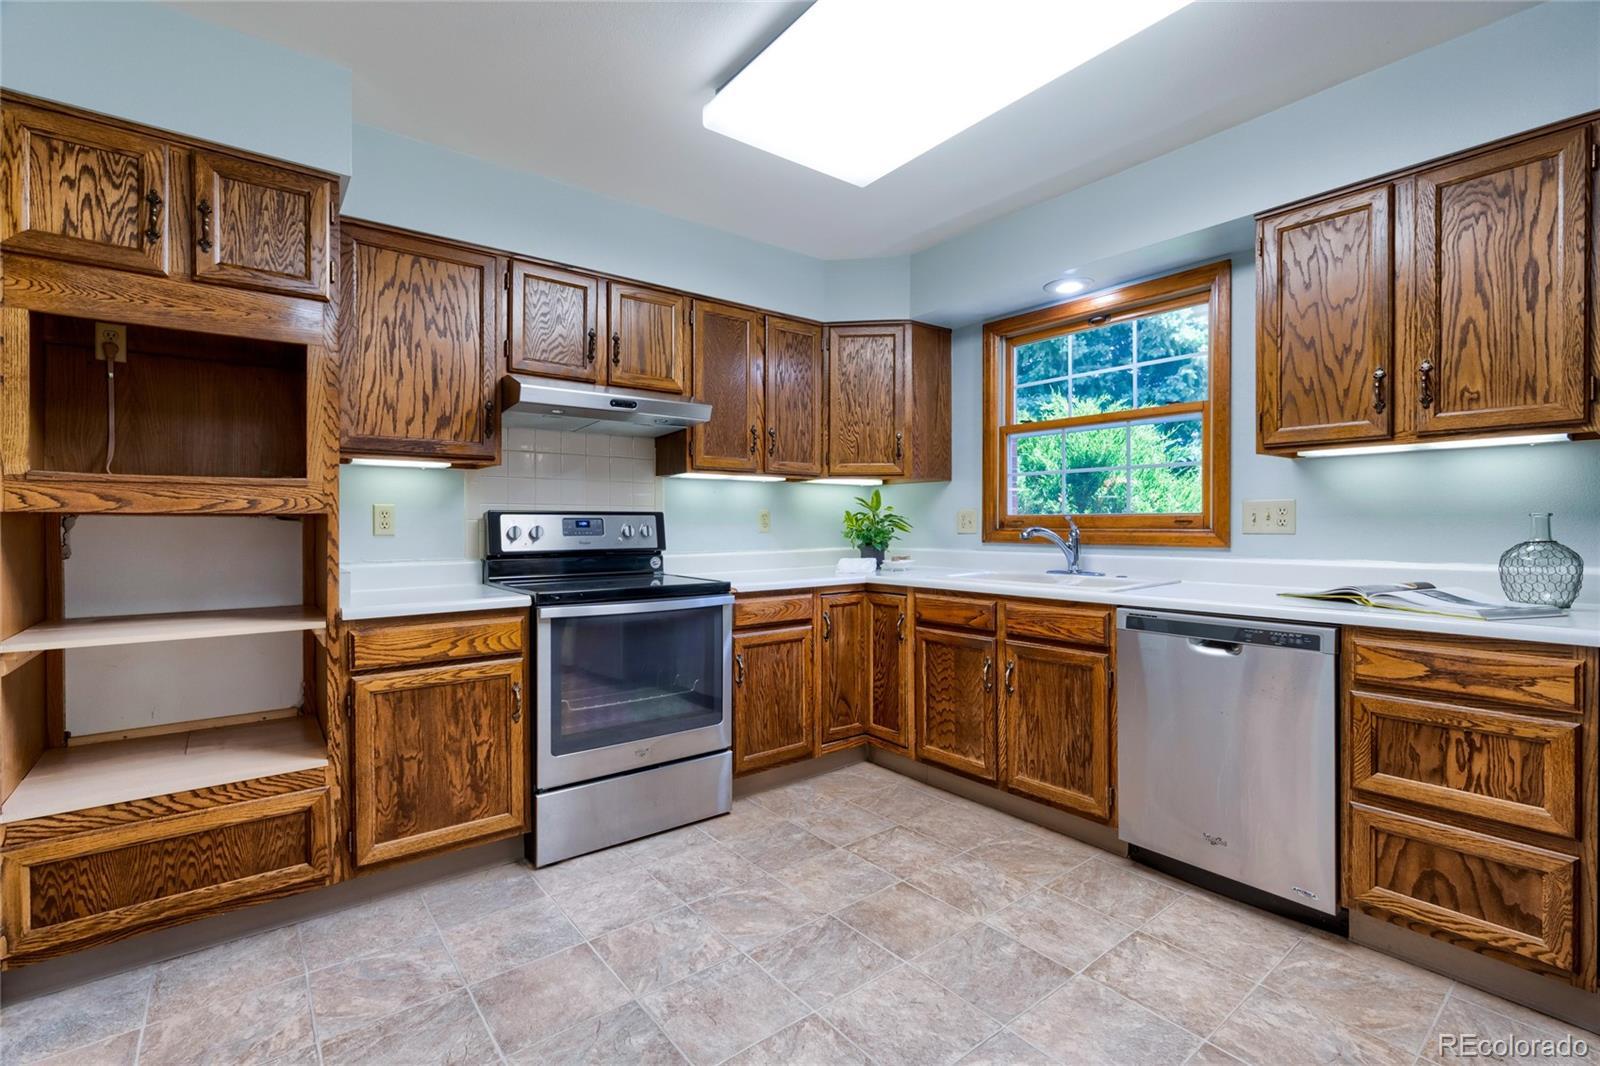 MLS# 6009976 - 12 - 720 Arbor Avenue #16, Fort Collins, CO 80526